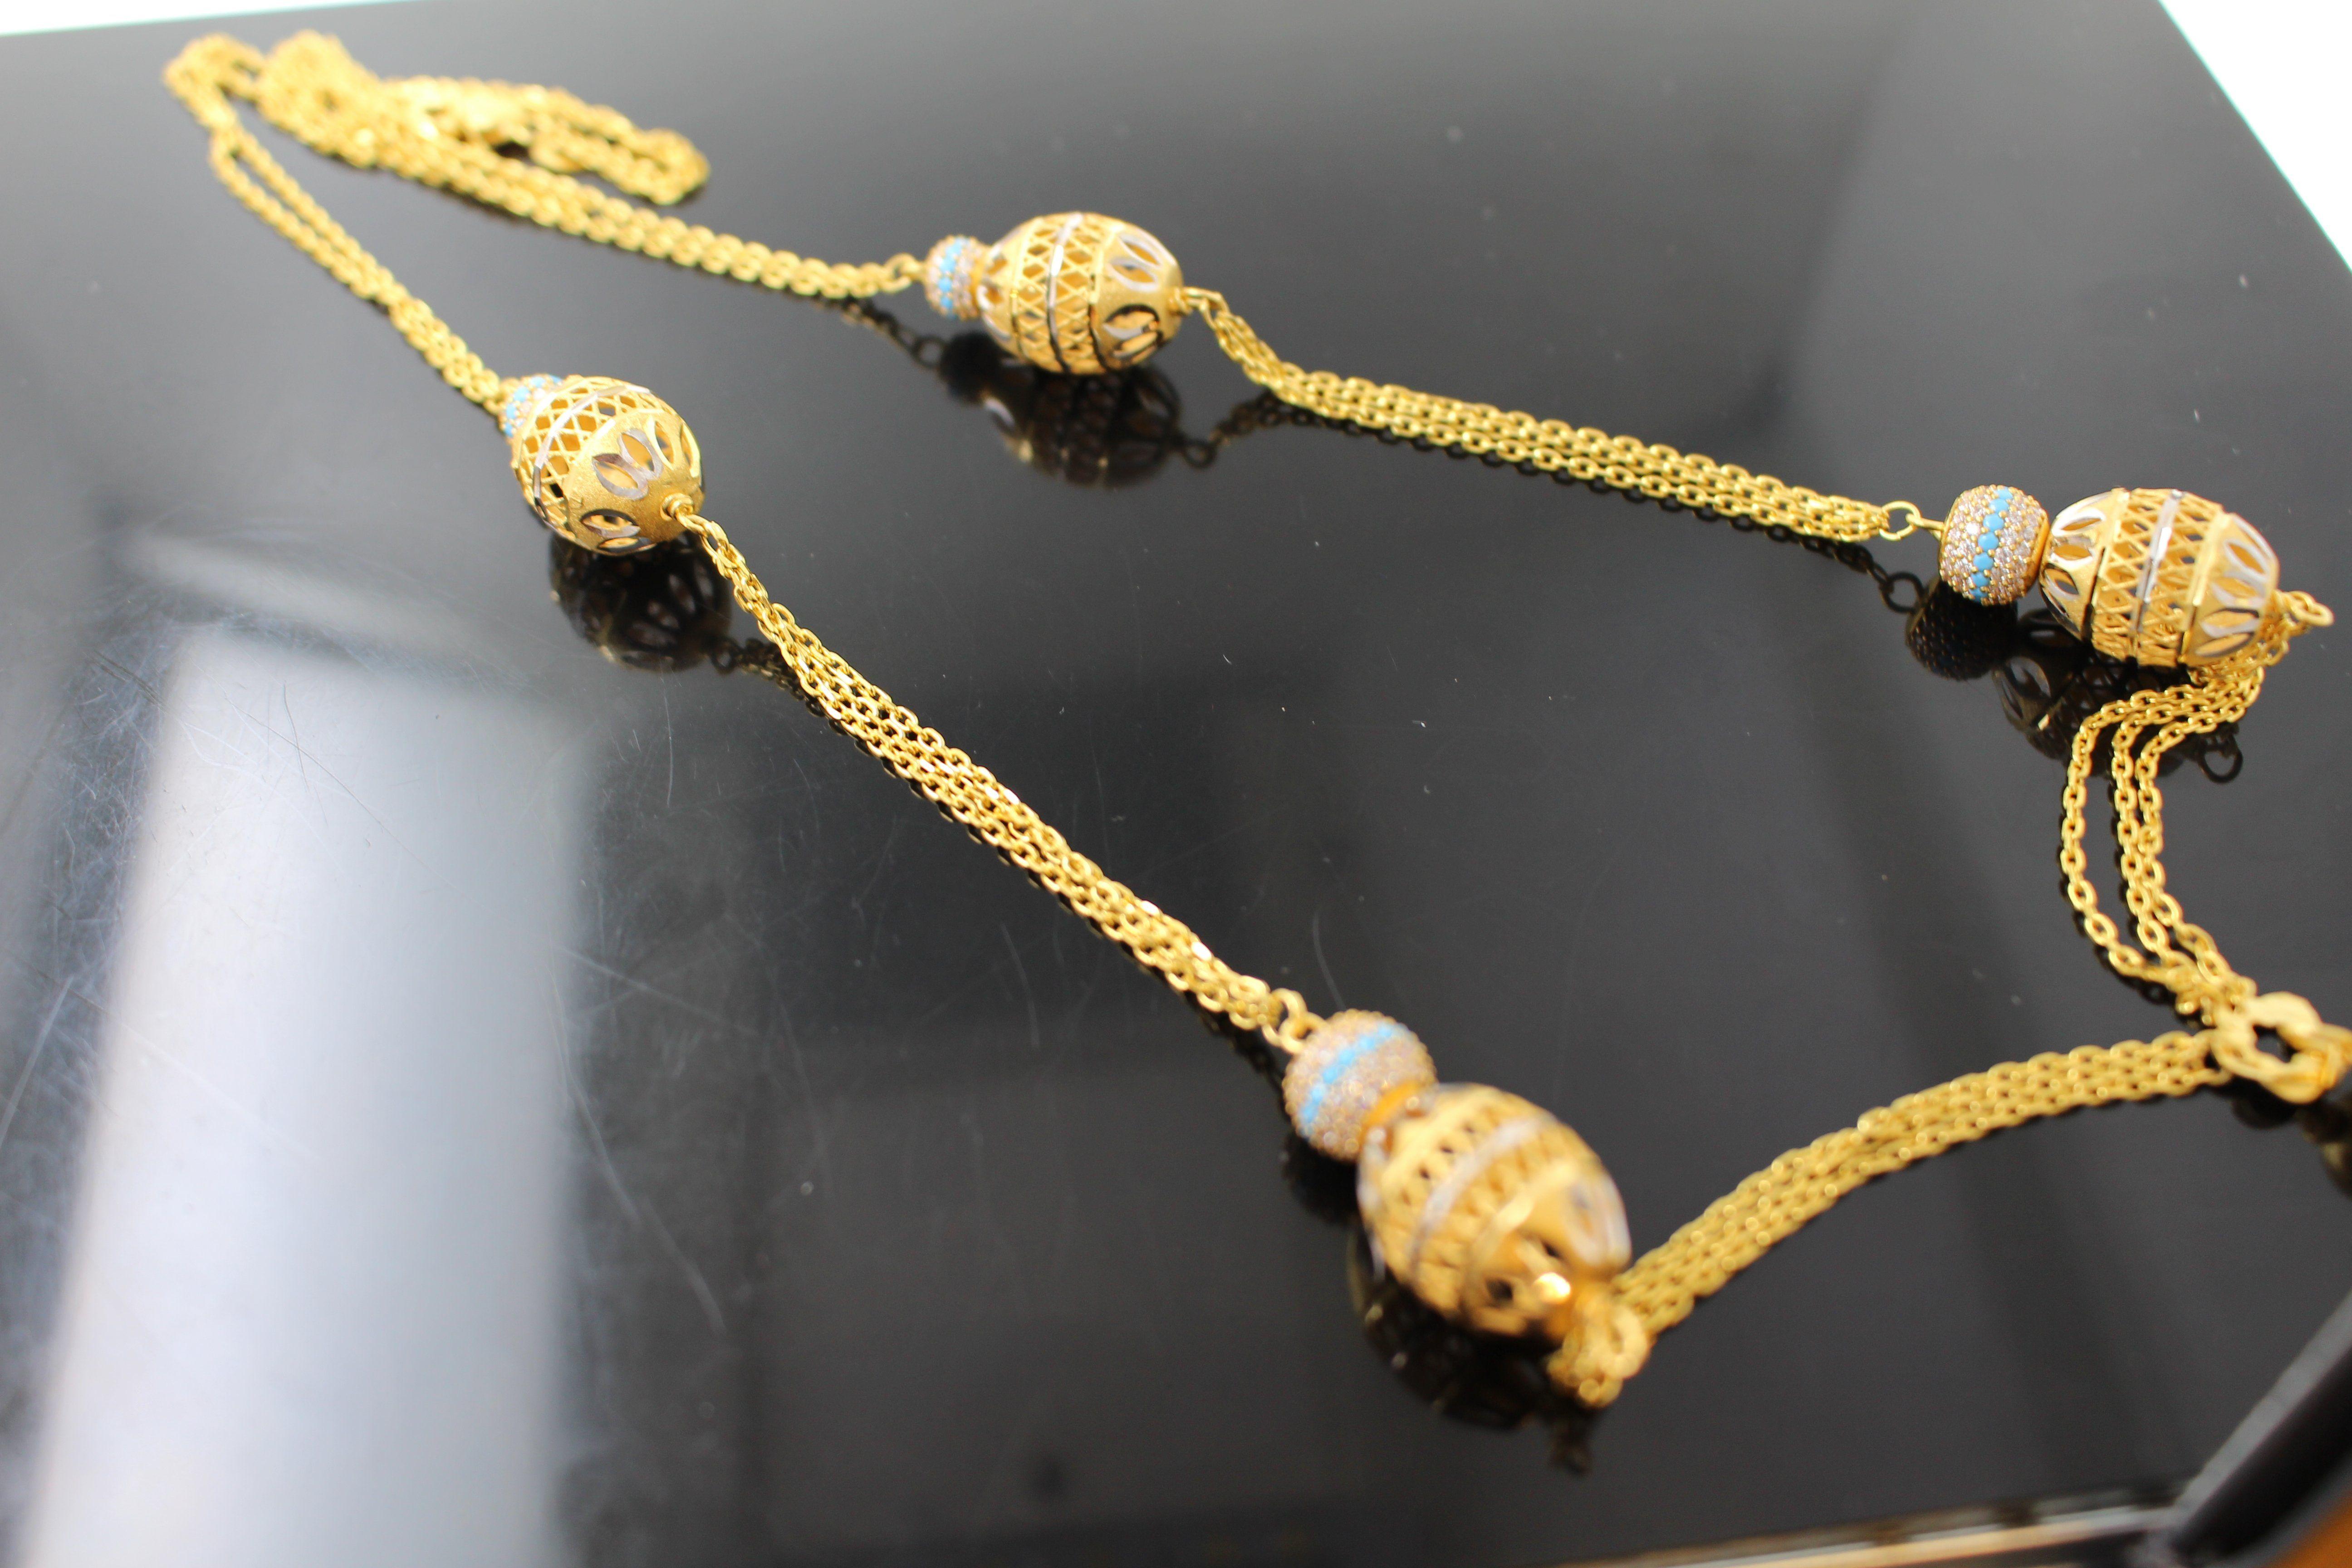 K elegant ladies necklace classic charm ball design c clip on